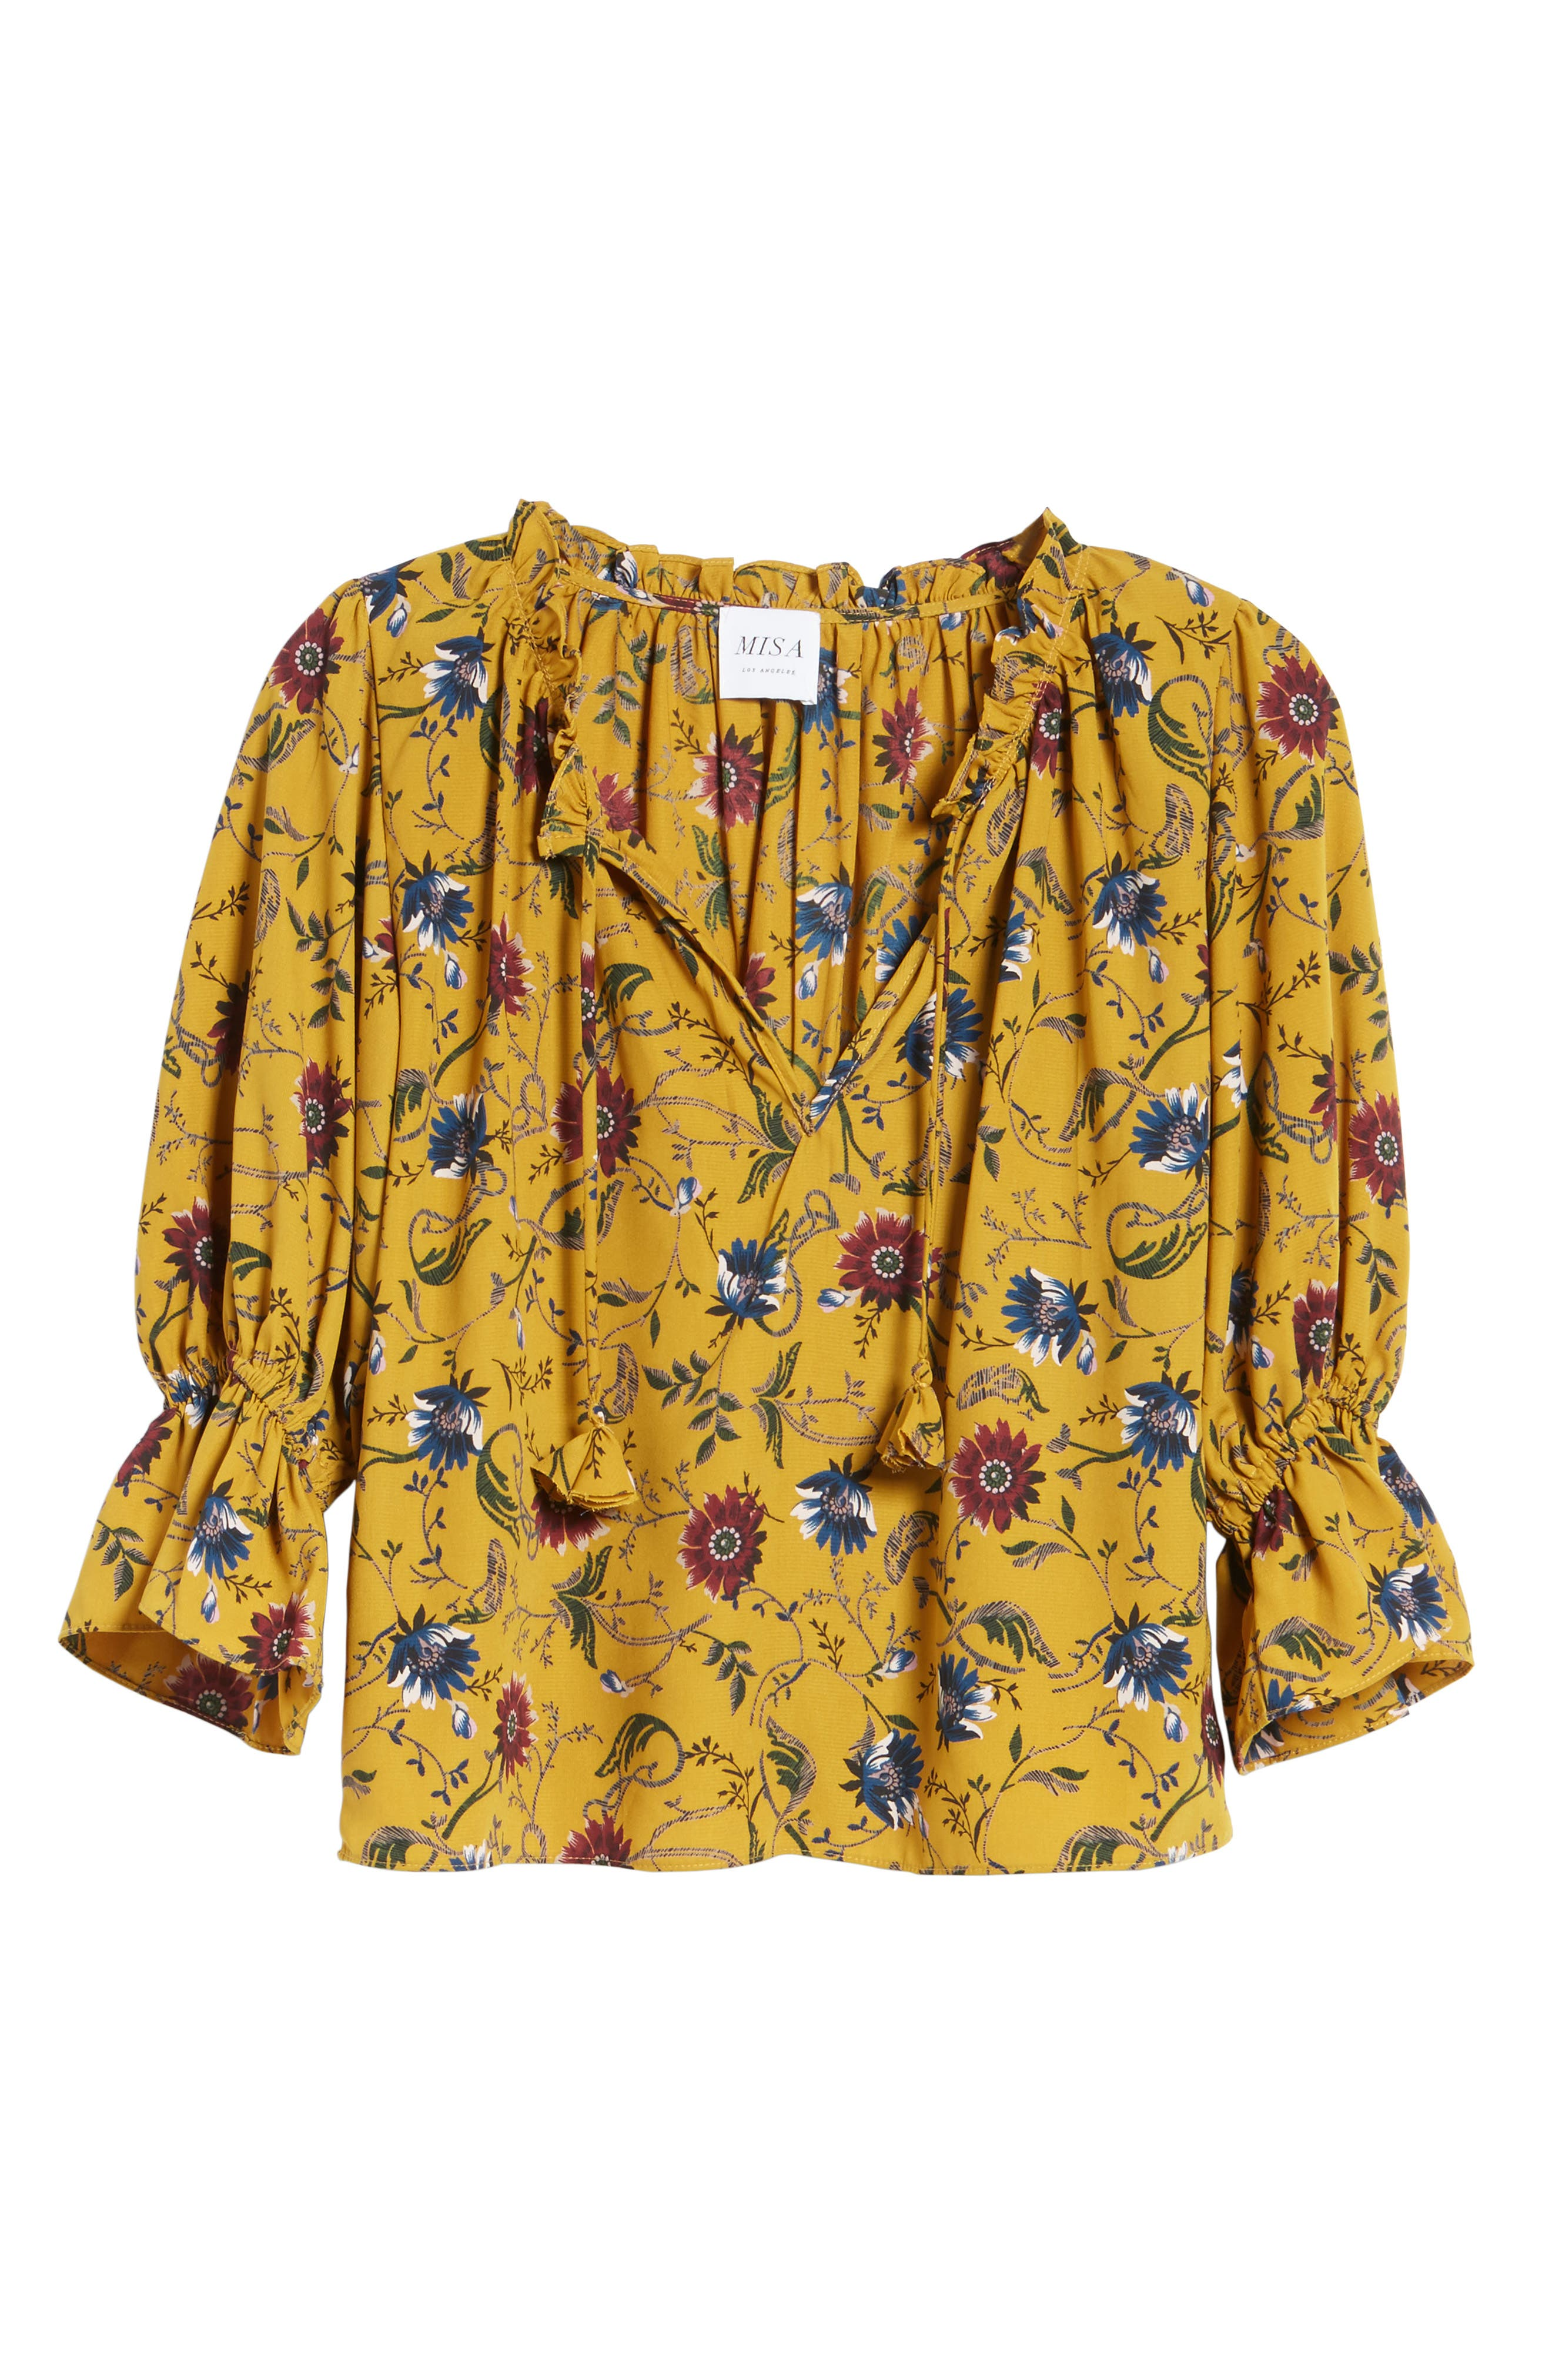 Danee Floral Top,                             Alternate thumbnail 6, color,                             Marigold/ Ivory